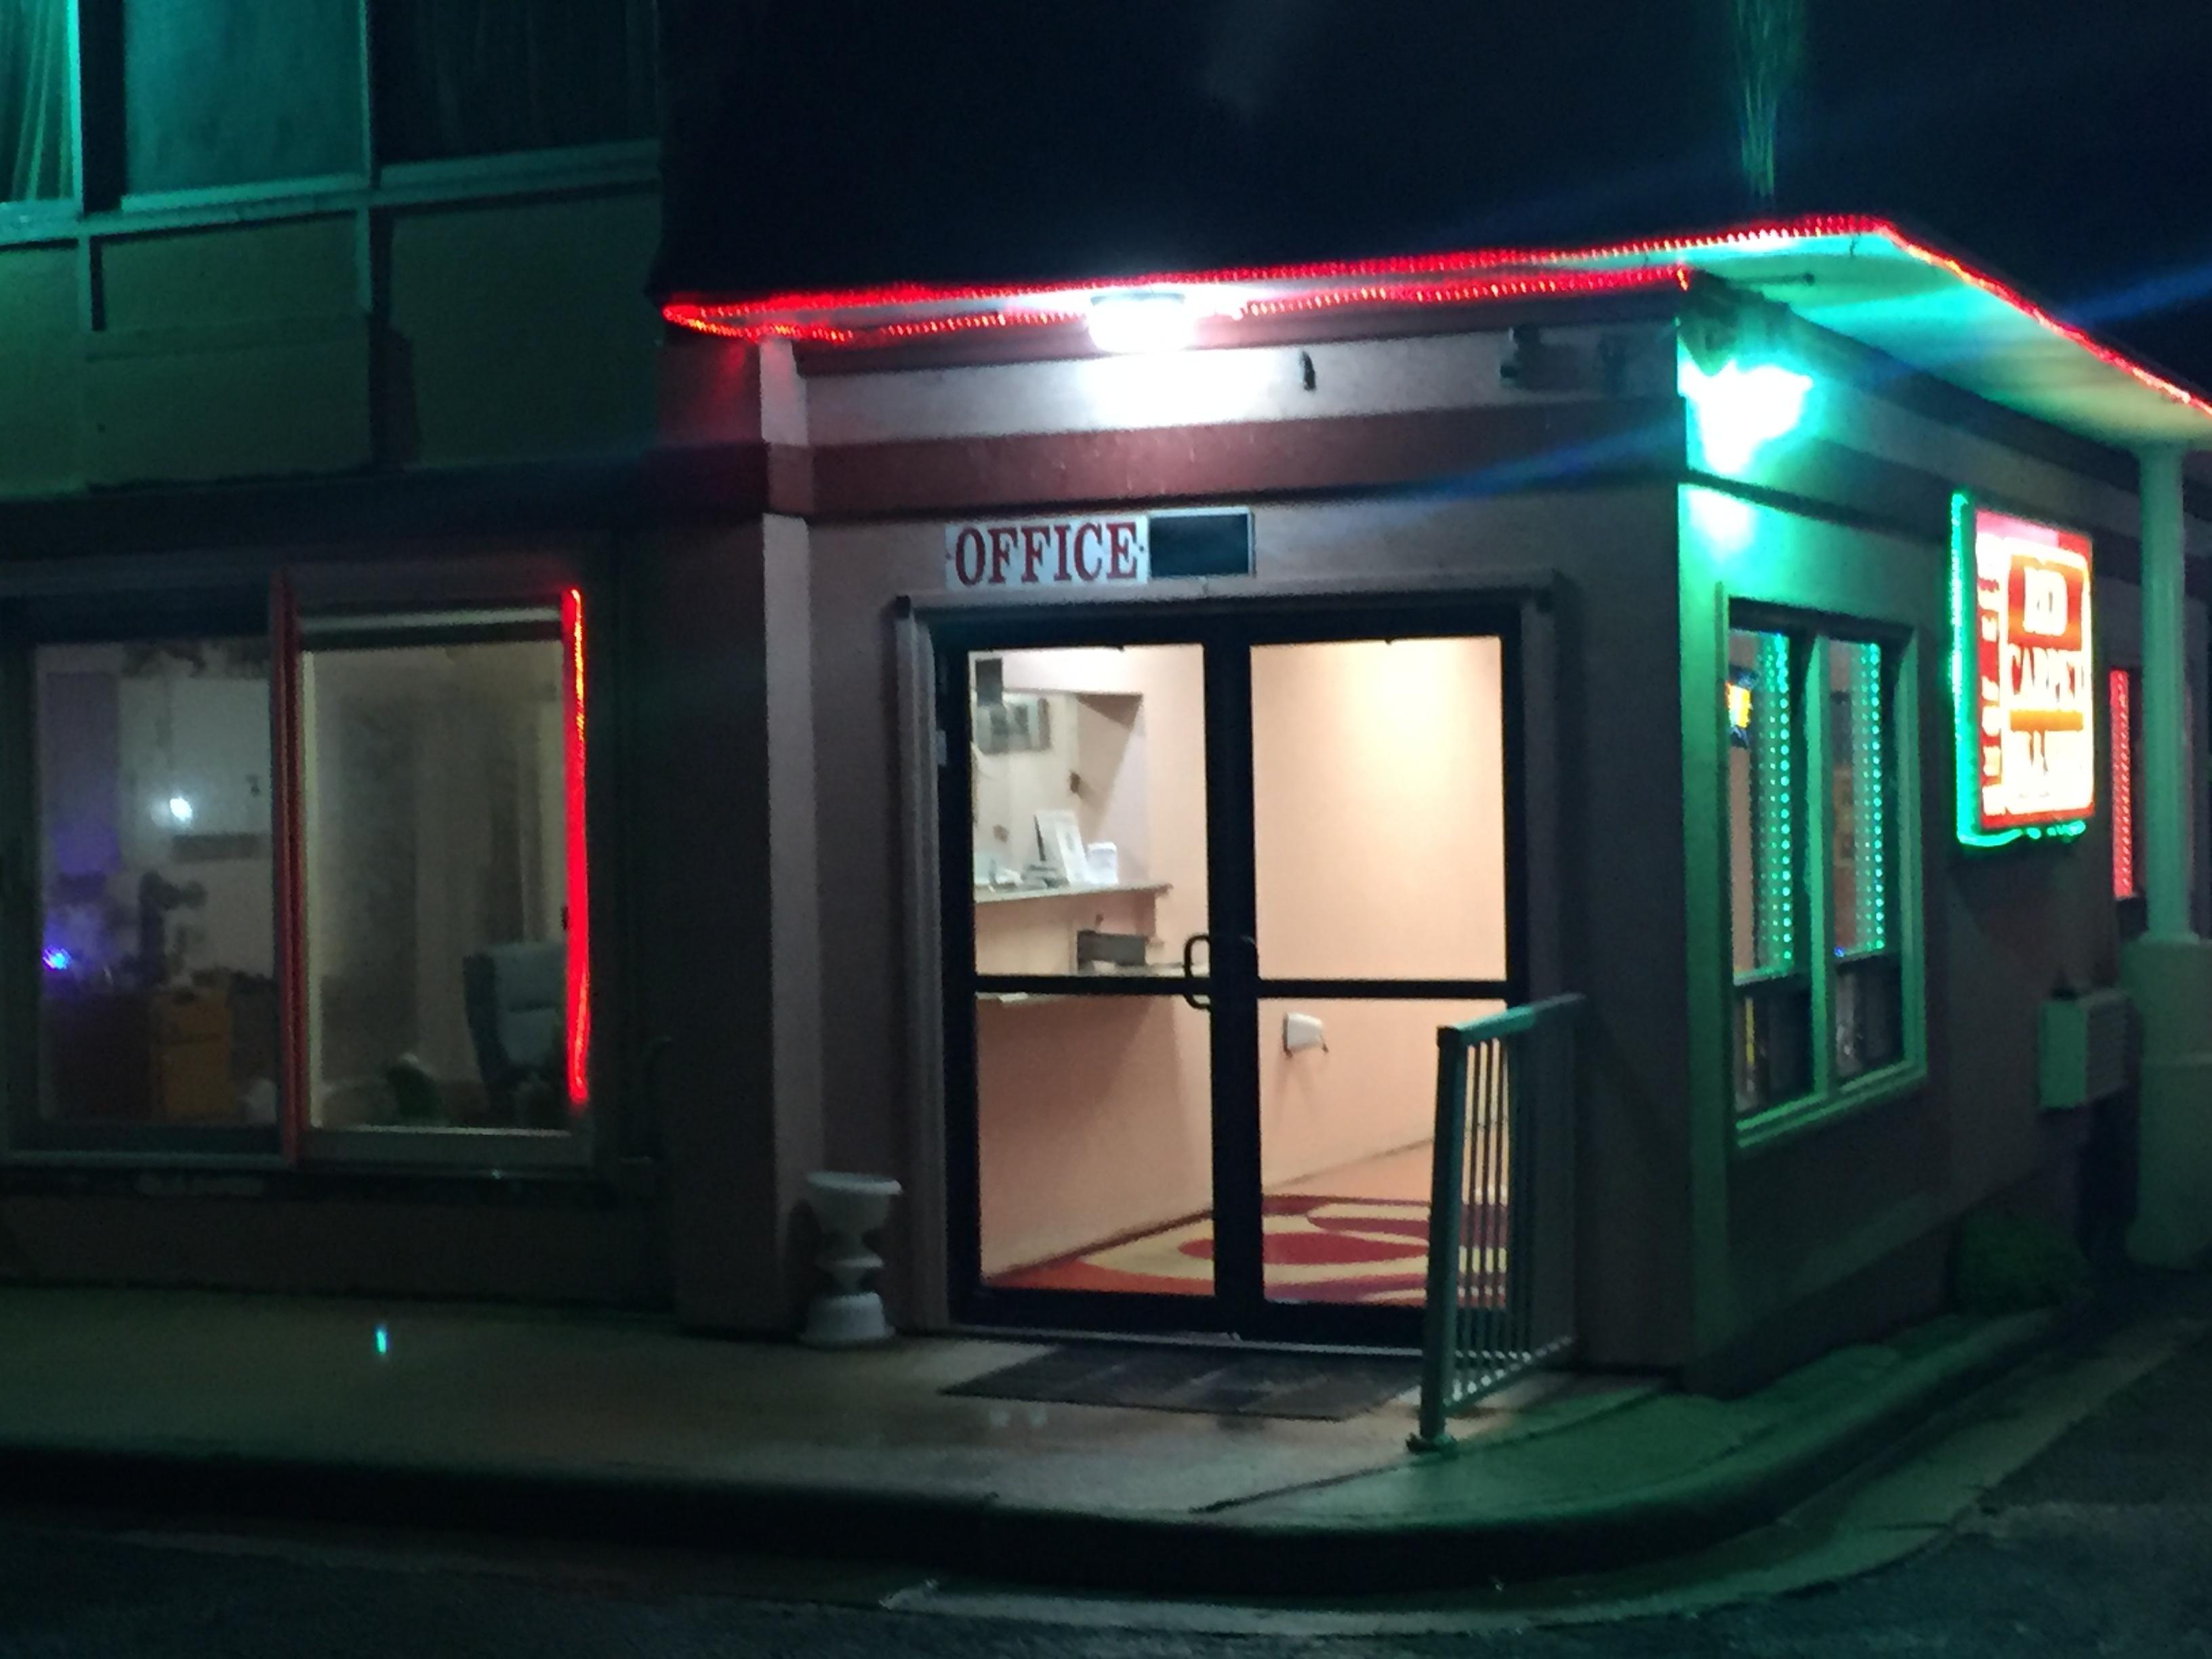 Red Carpet Inn & Suites image 12